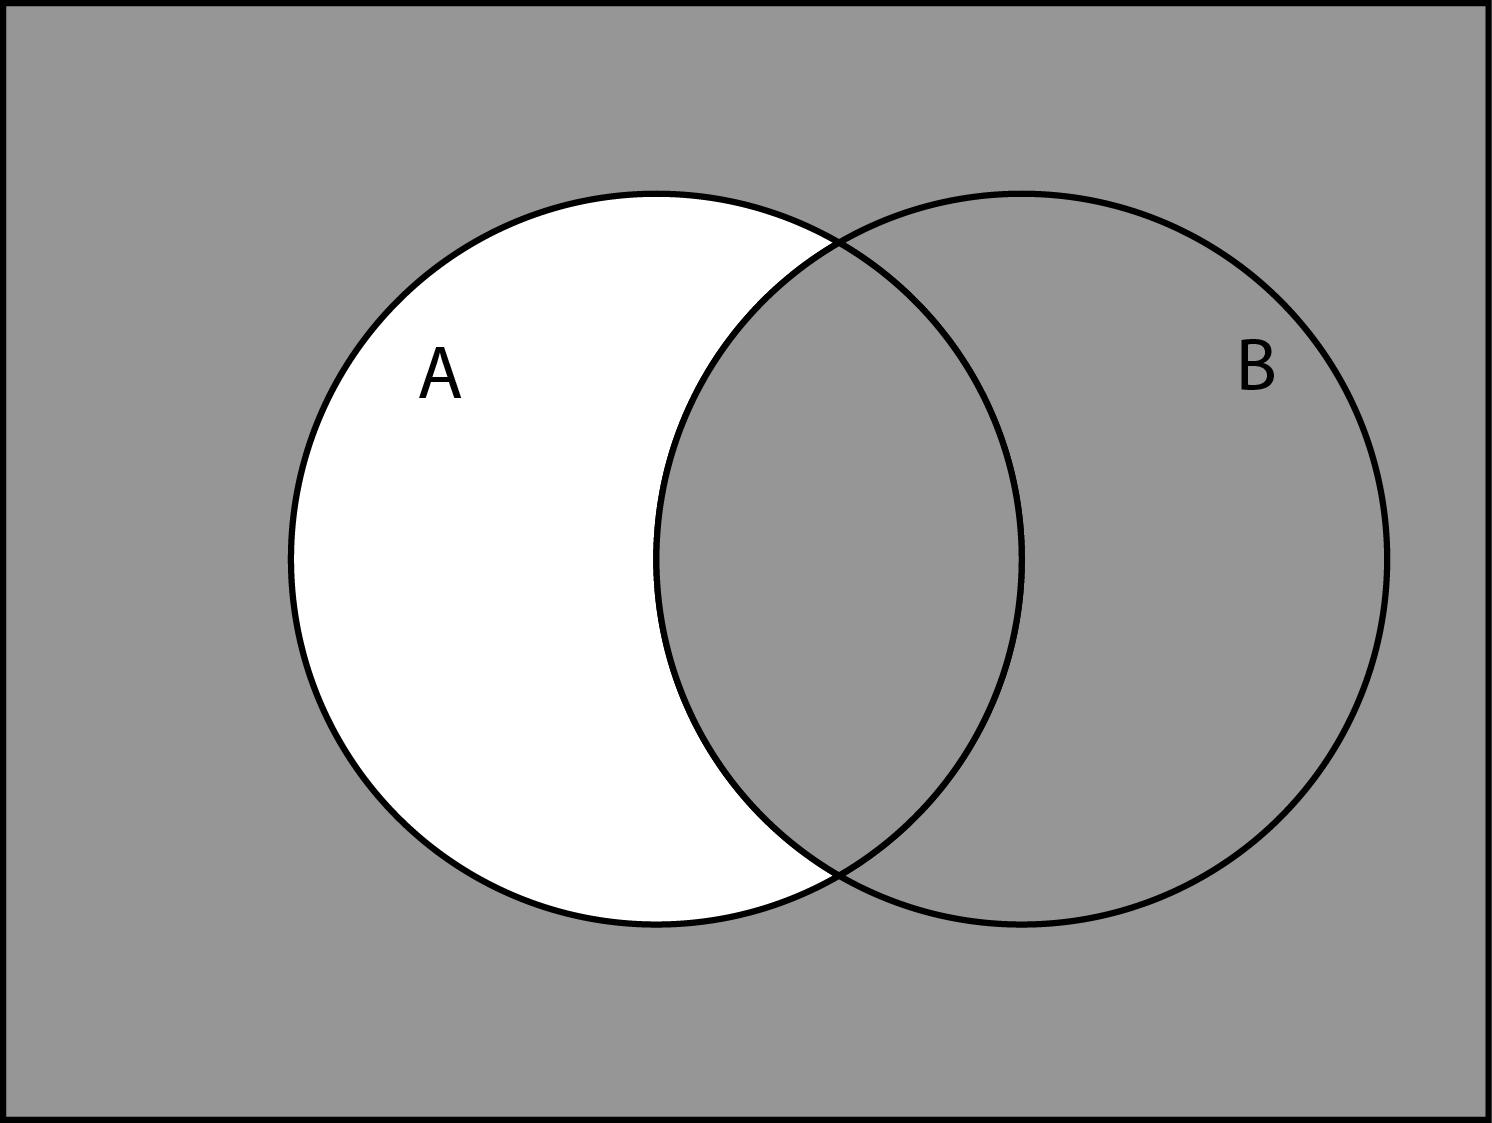 Index of johwd63181mat142venn diagram templates 2 set a prime union bg ccuart Image collections